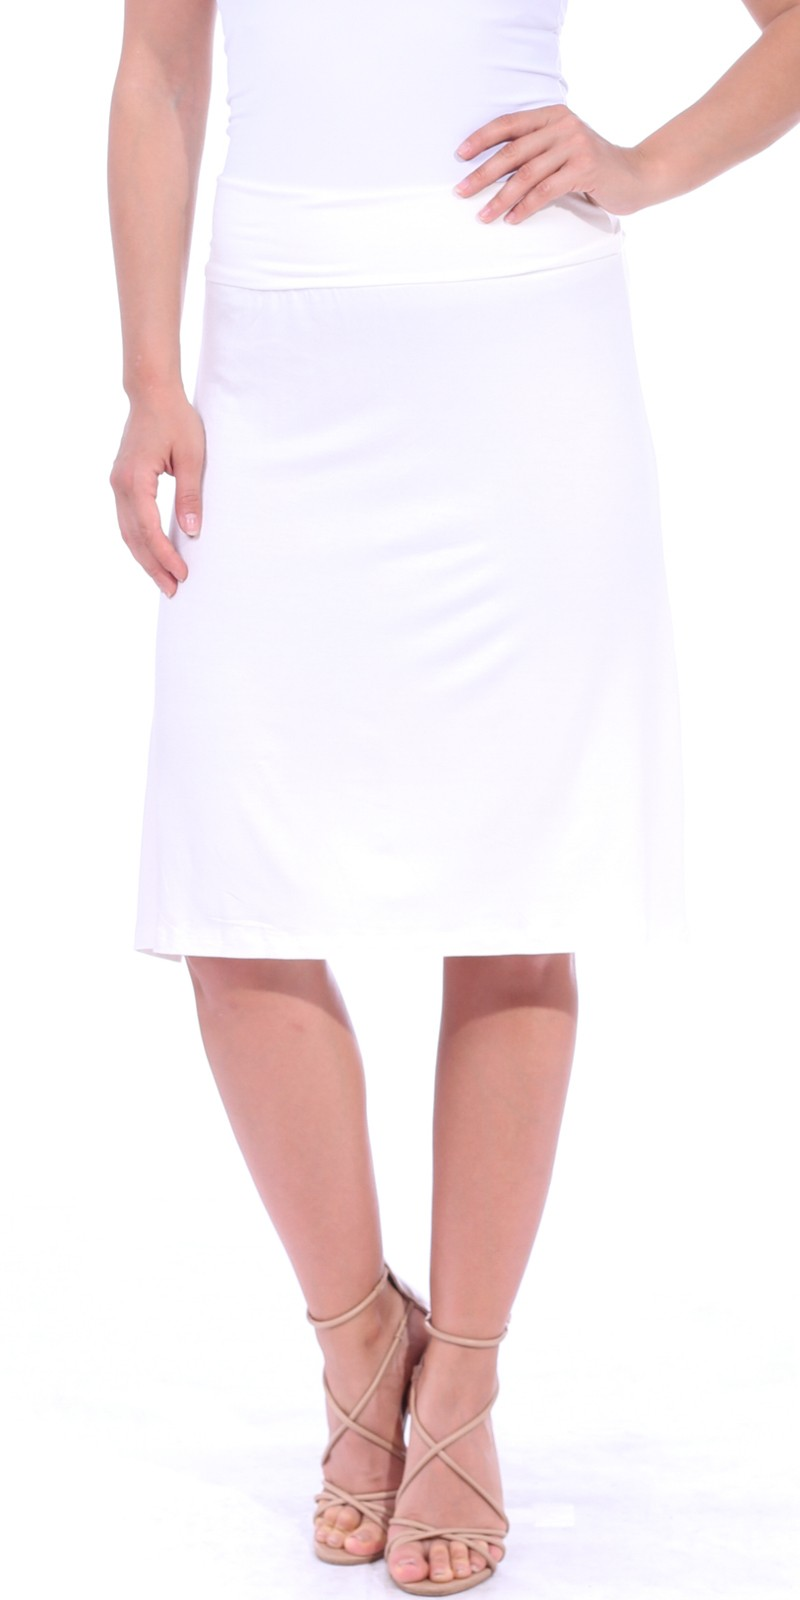 Short Maxi Skirt - Knee Length Fold Over High Waisted Midi Skirt - Made in USA - Pearl